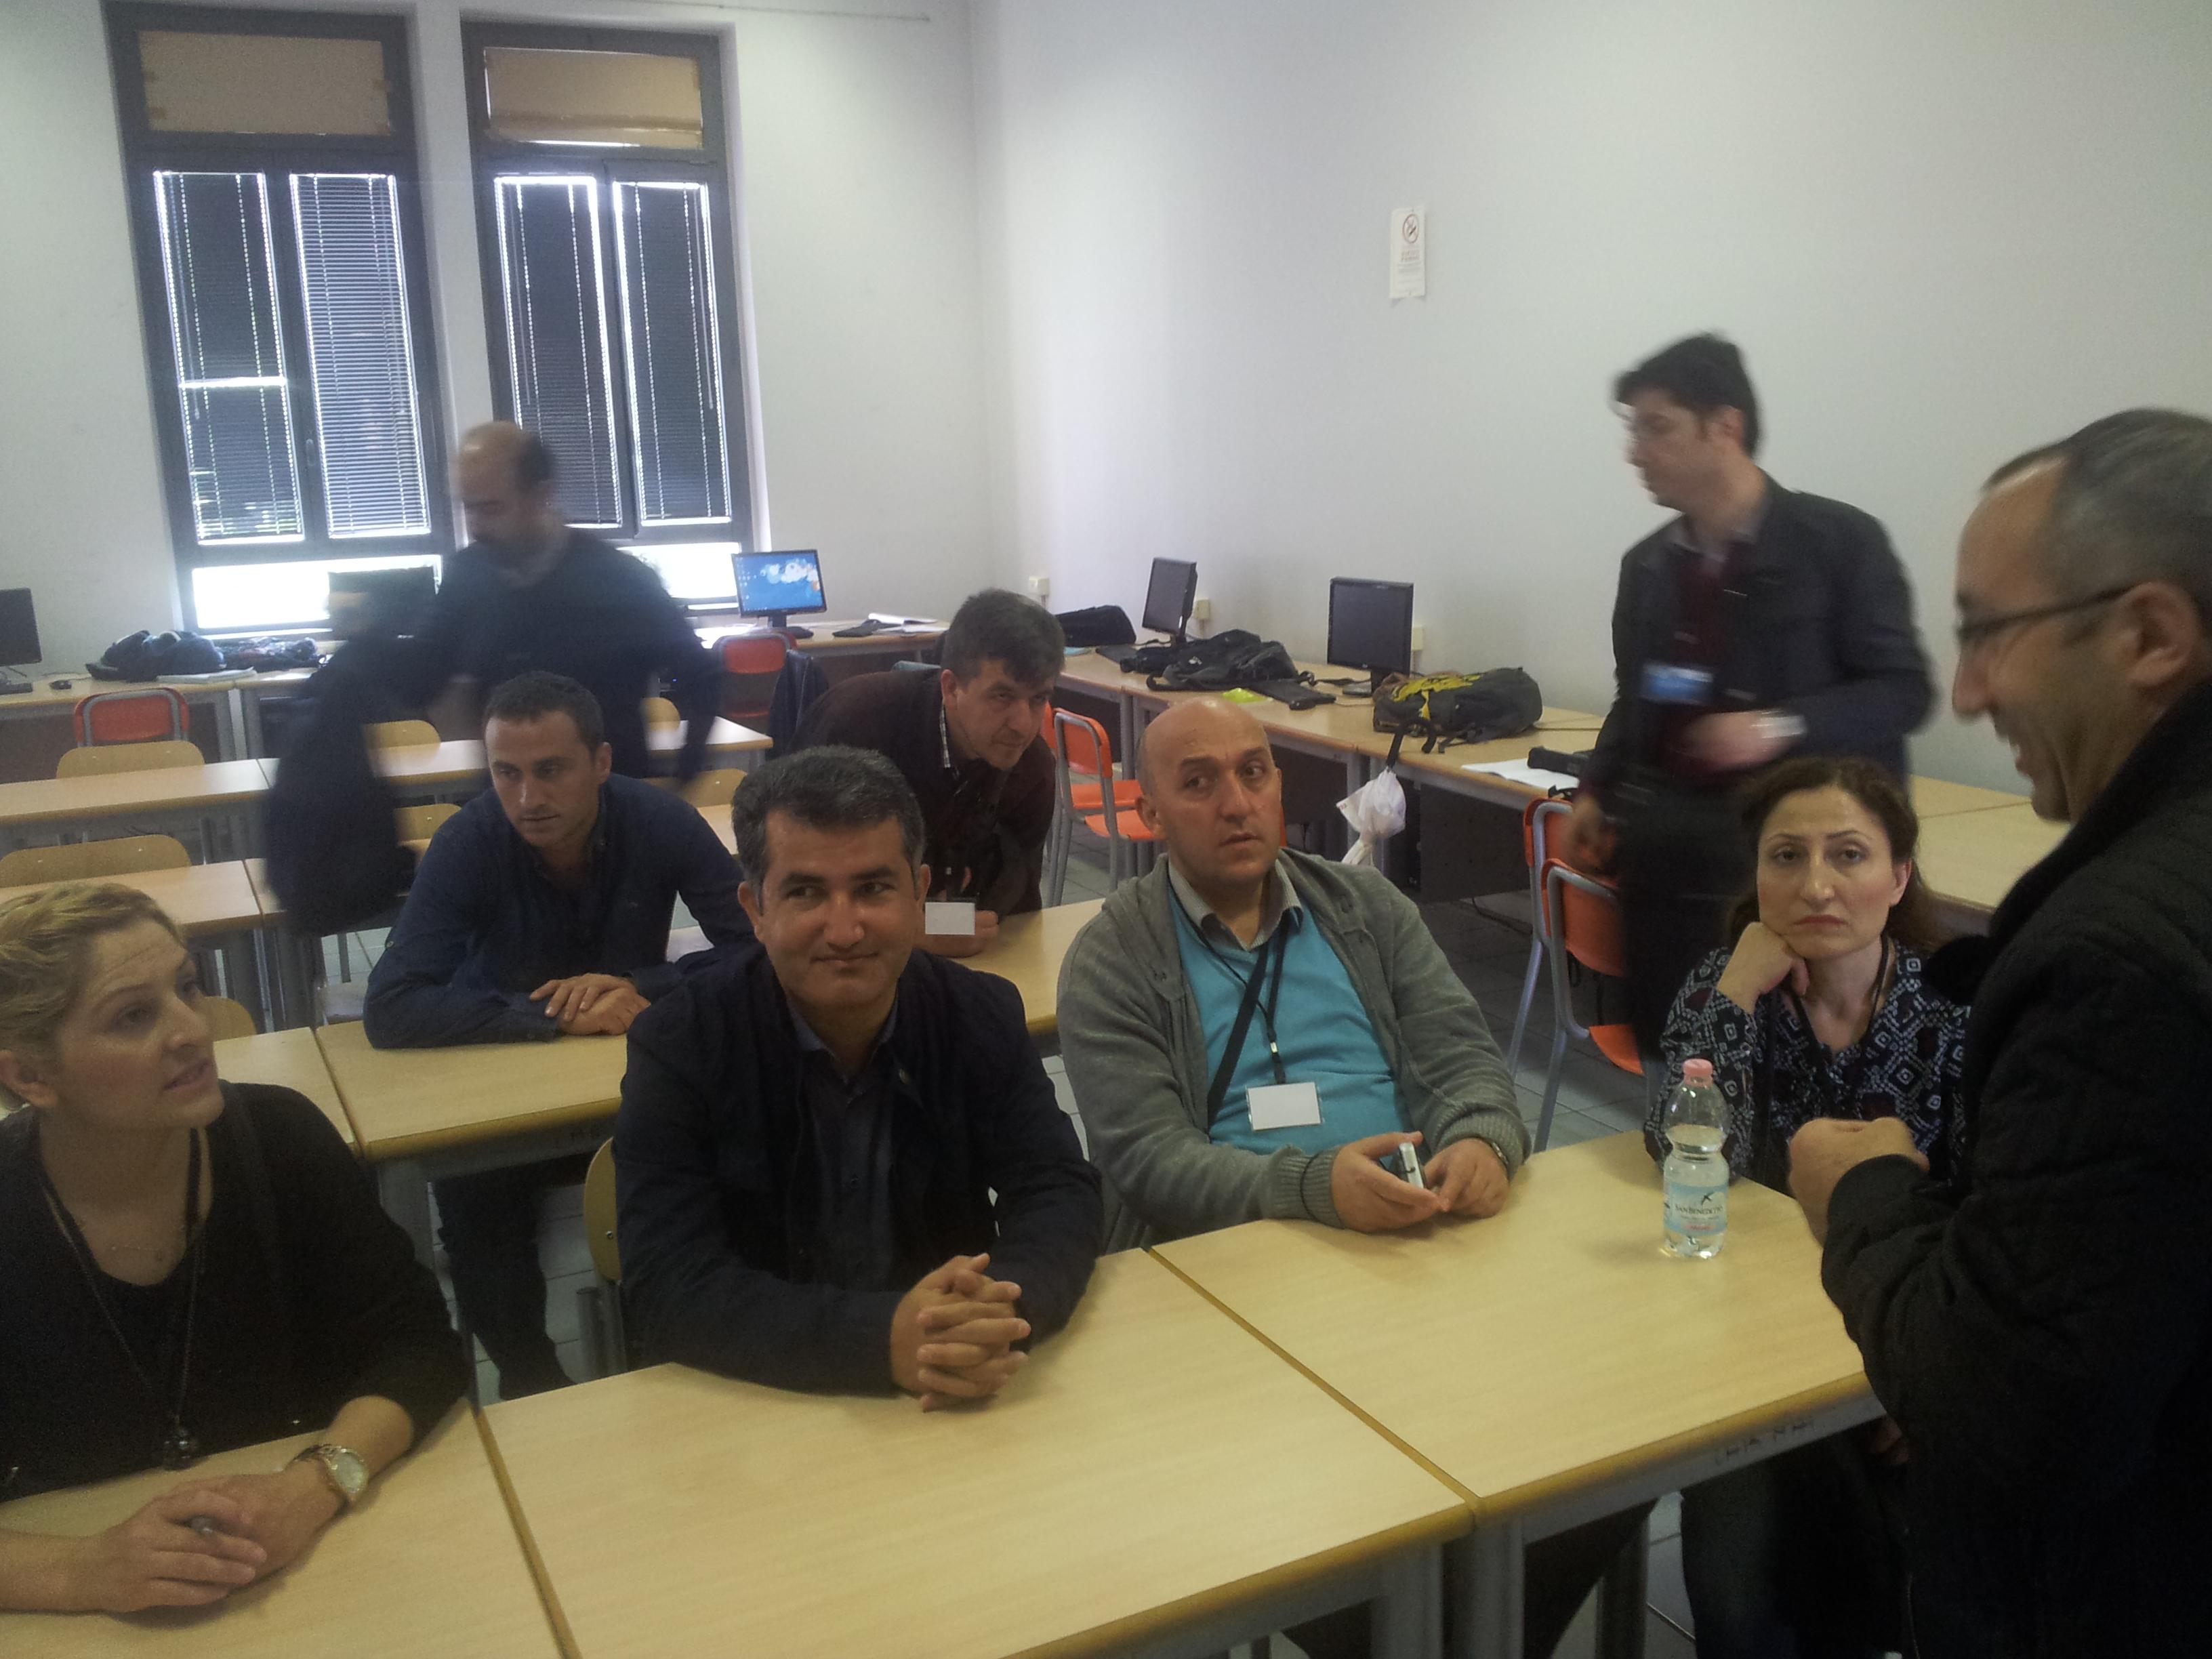 Erasmus plus training course : Effective Use of ICT in Education